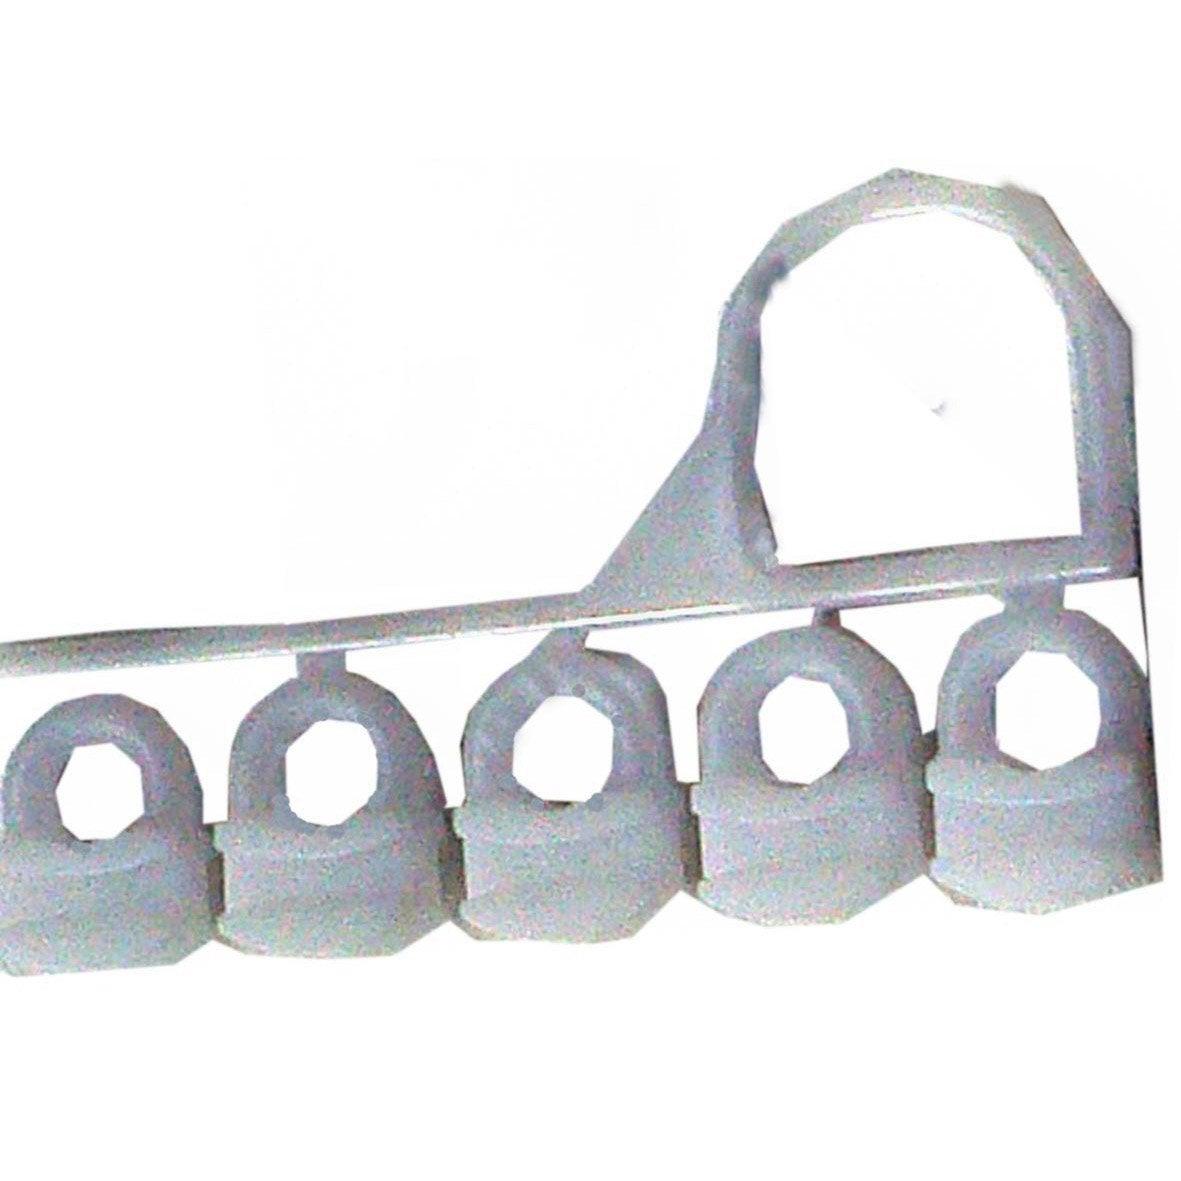 Curseurs tringle rideau acier blanc ib leroy merlin - Tringle a rideau cable acier ...